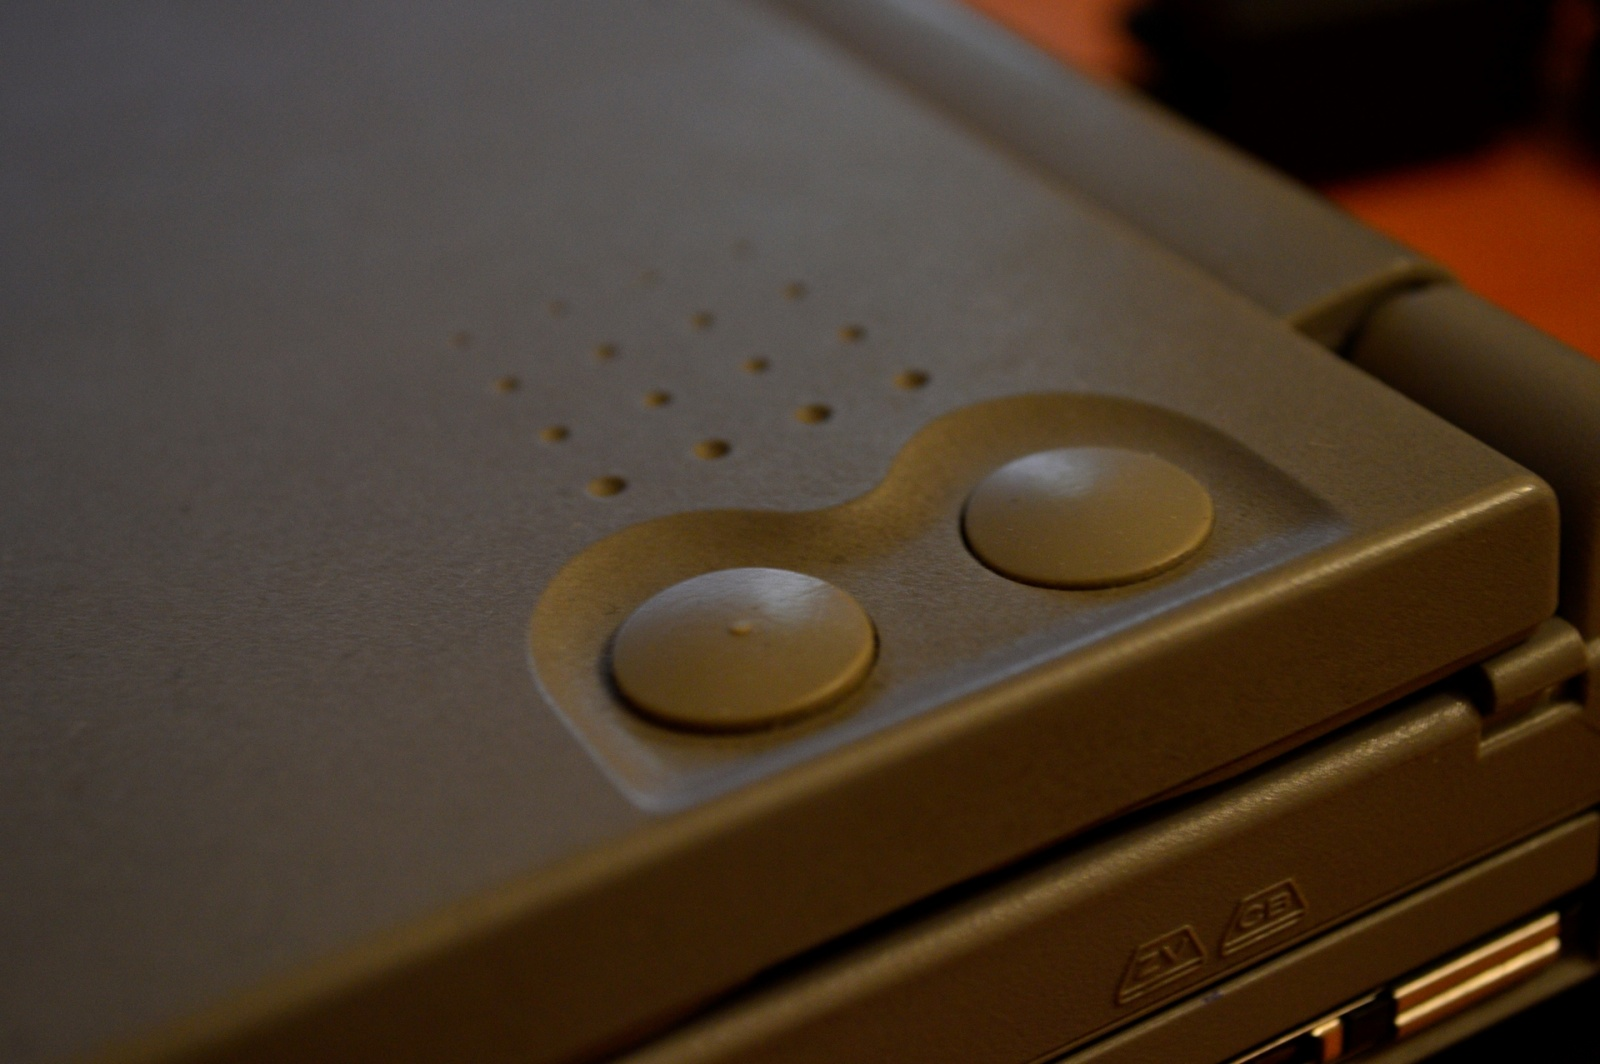 Какими были ноутбуки 20 лет назад на примере Toshiba libretto 100ct - 6